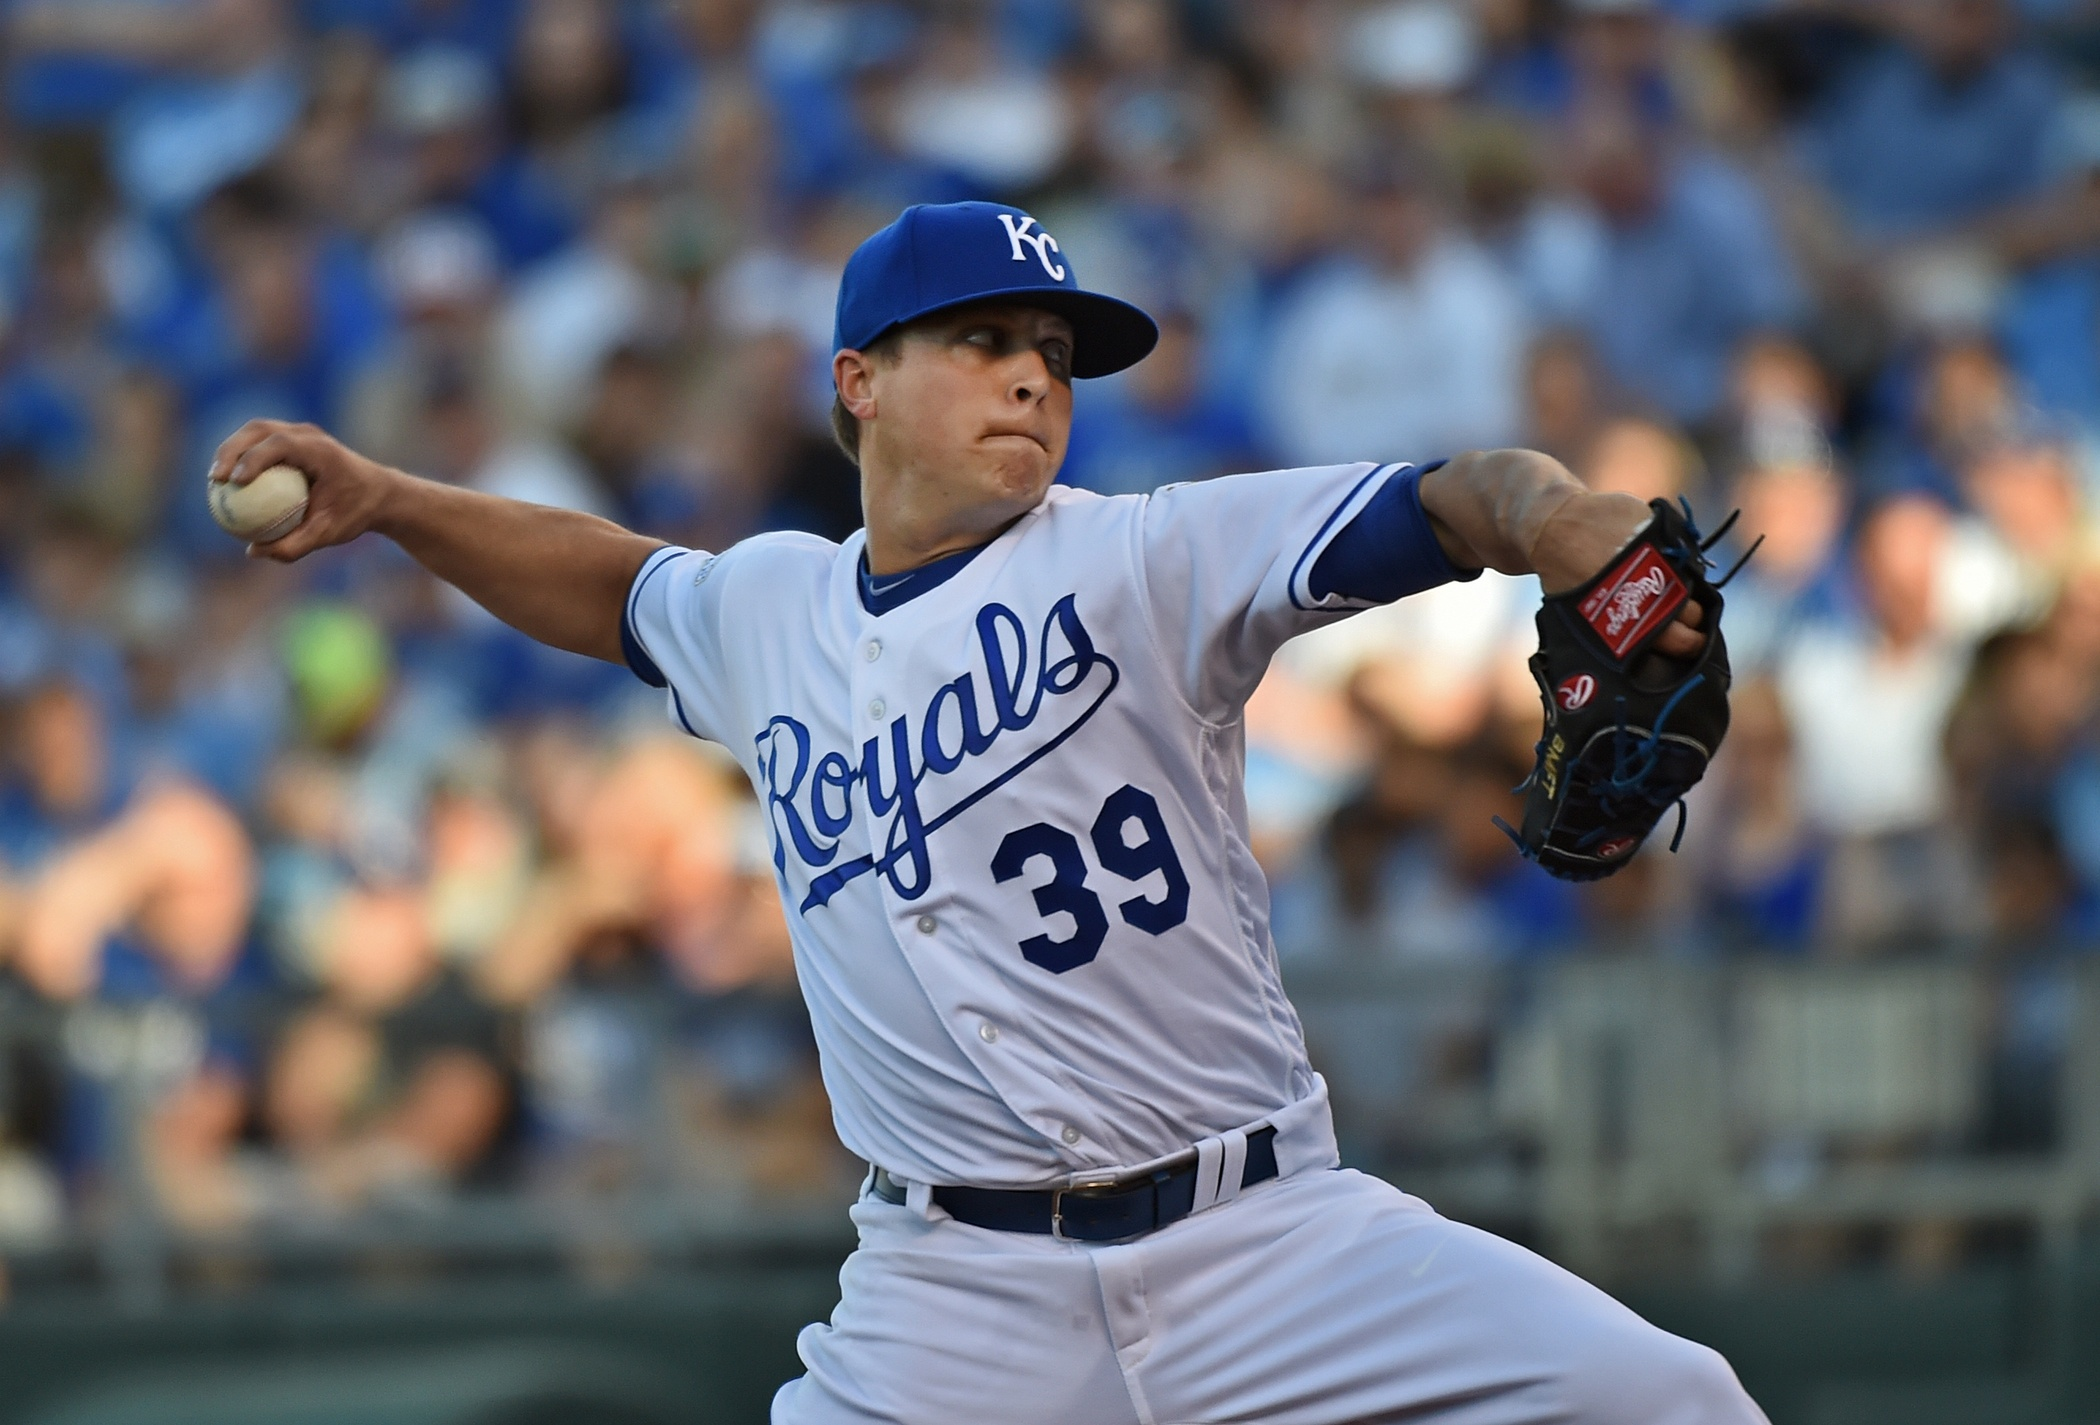 Kris Medlen, Kansas City Royals